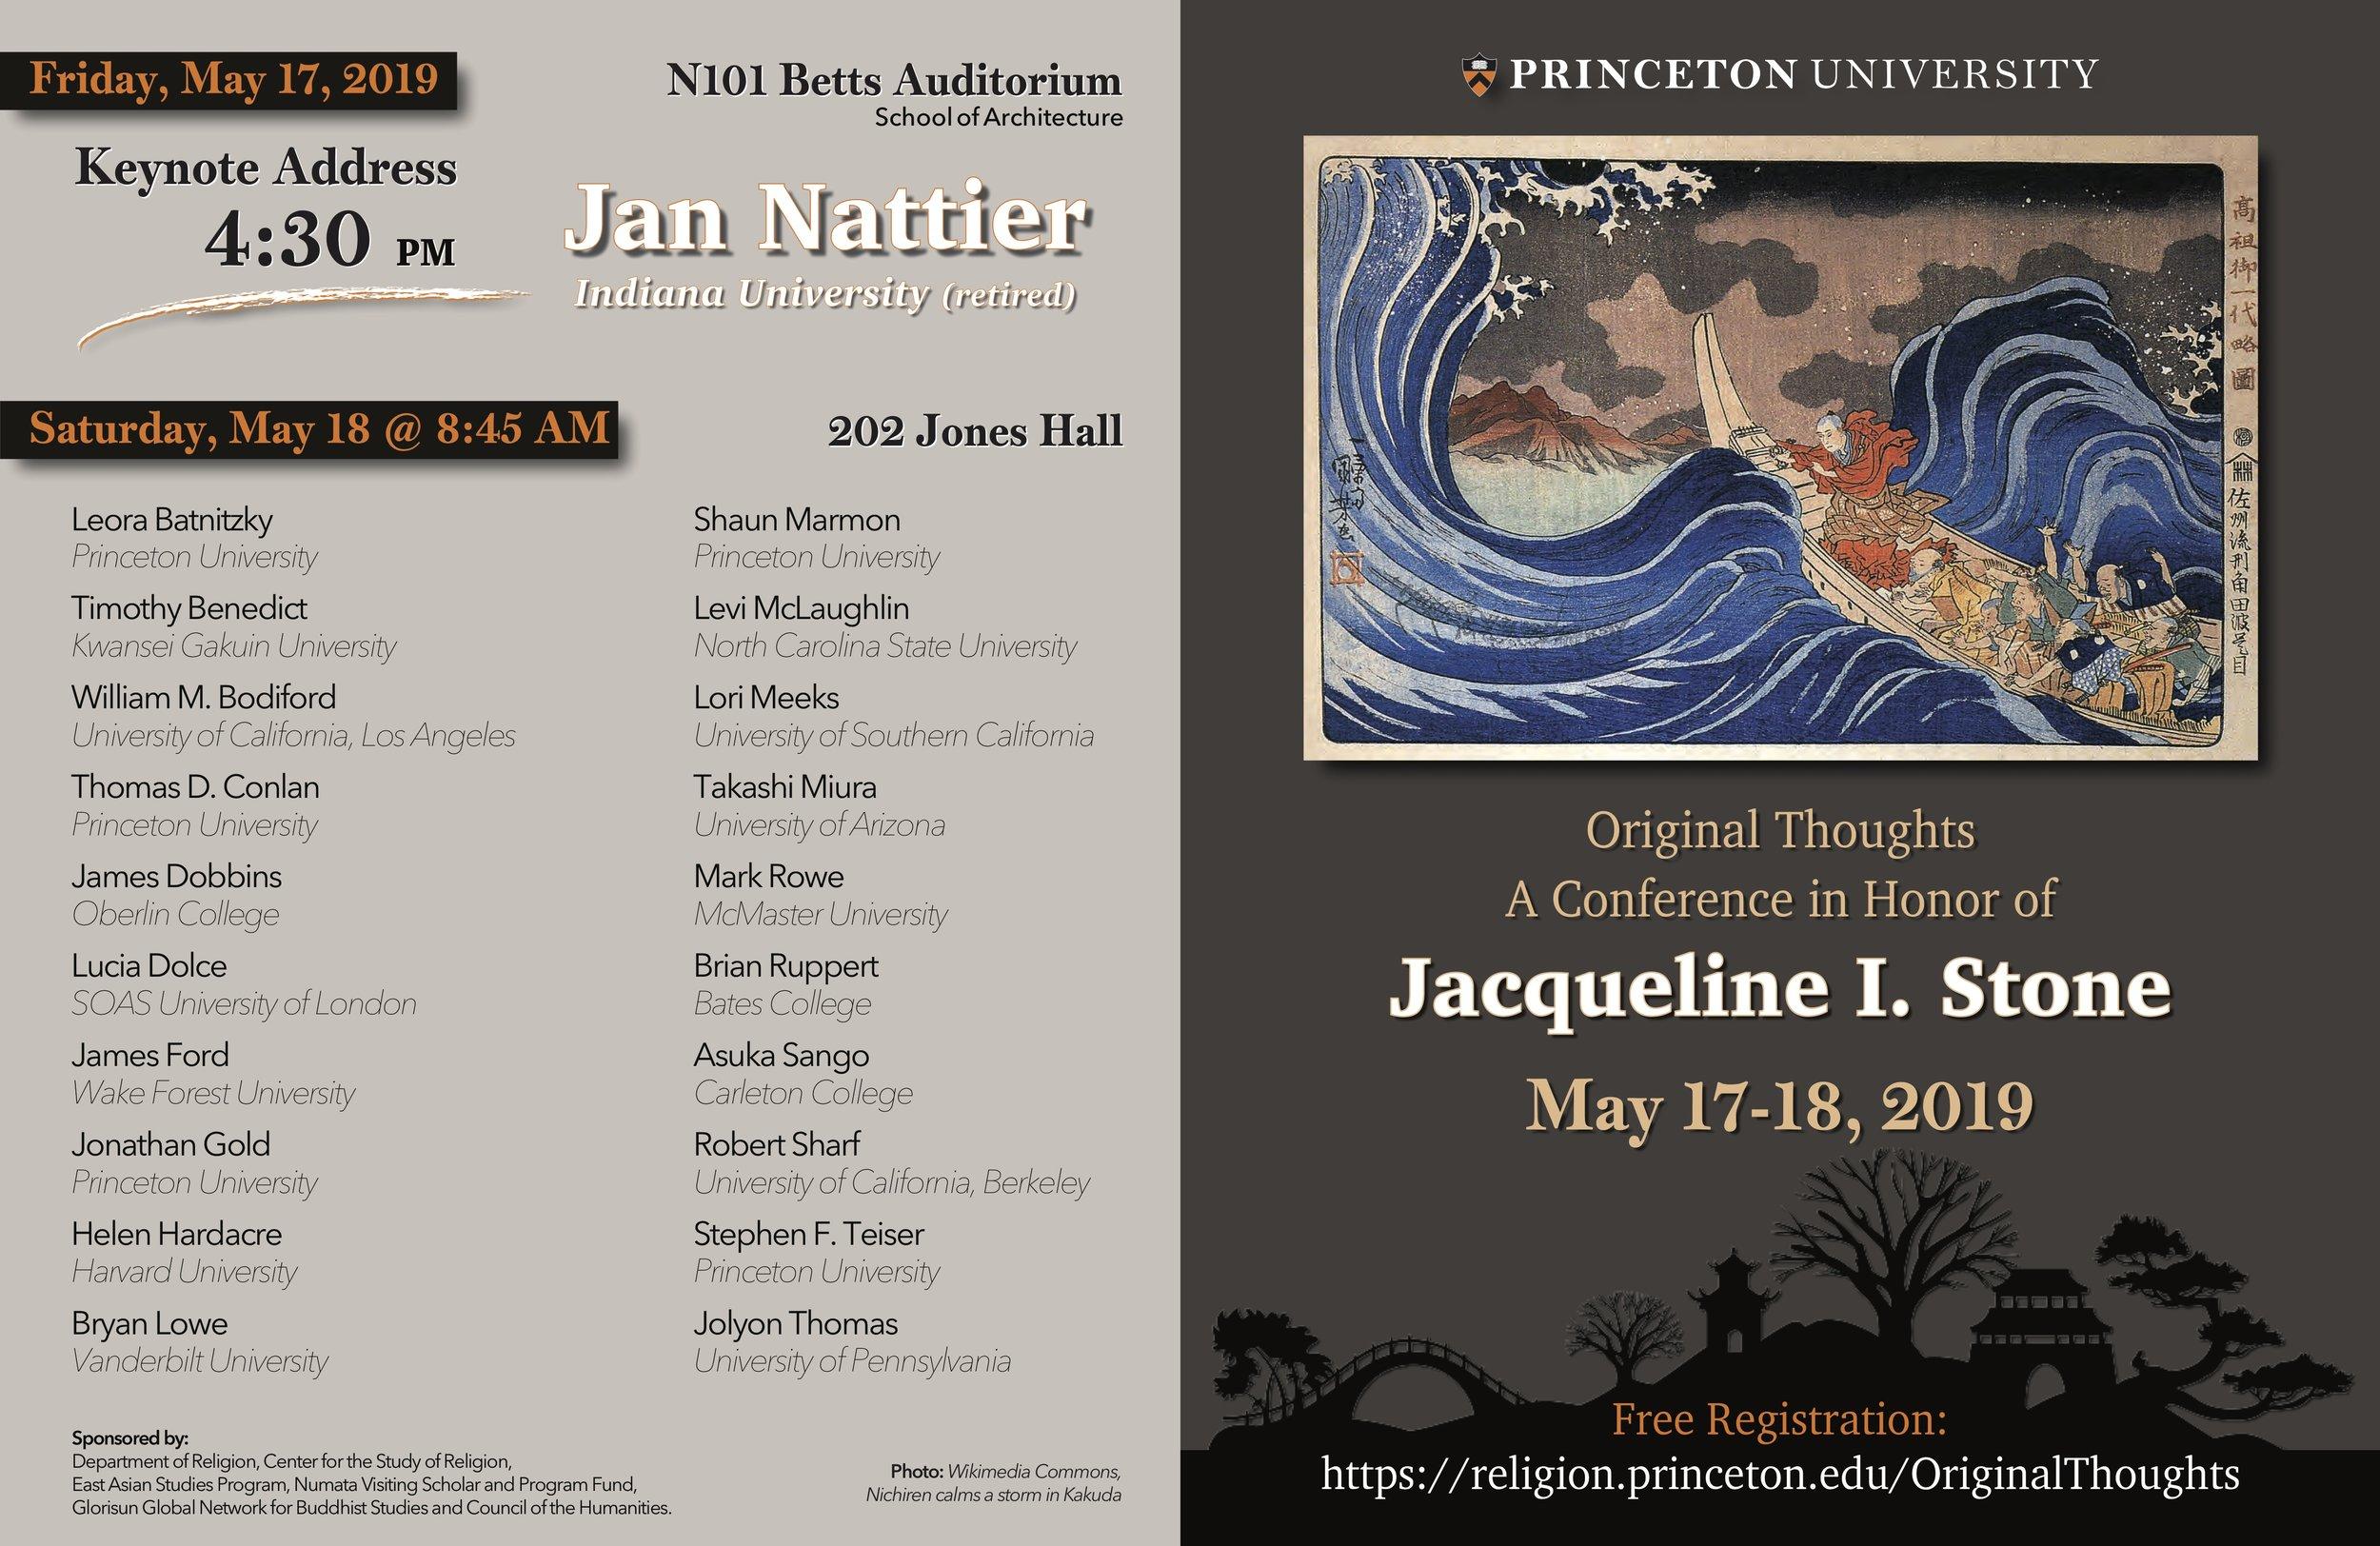 Jacqueline-Stone-Poster.jpg